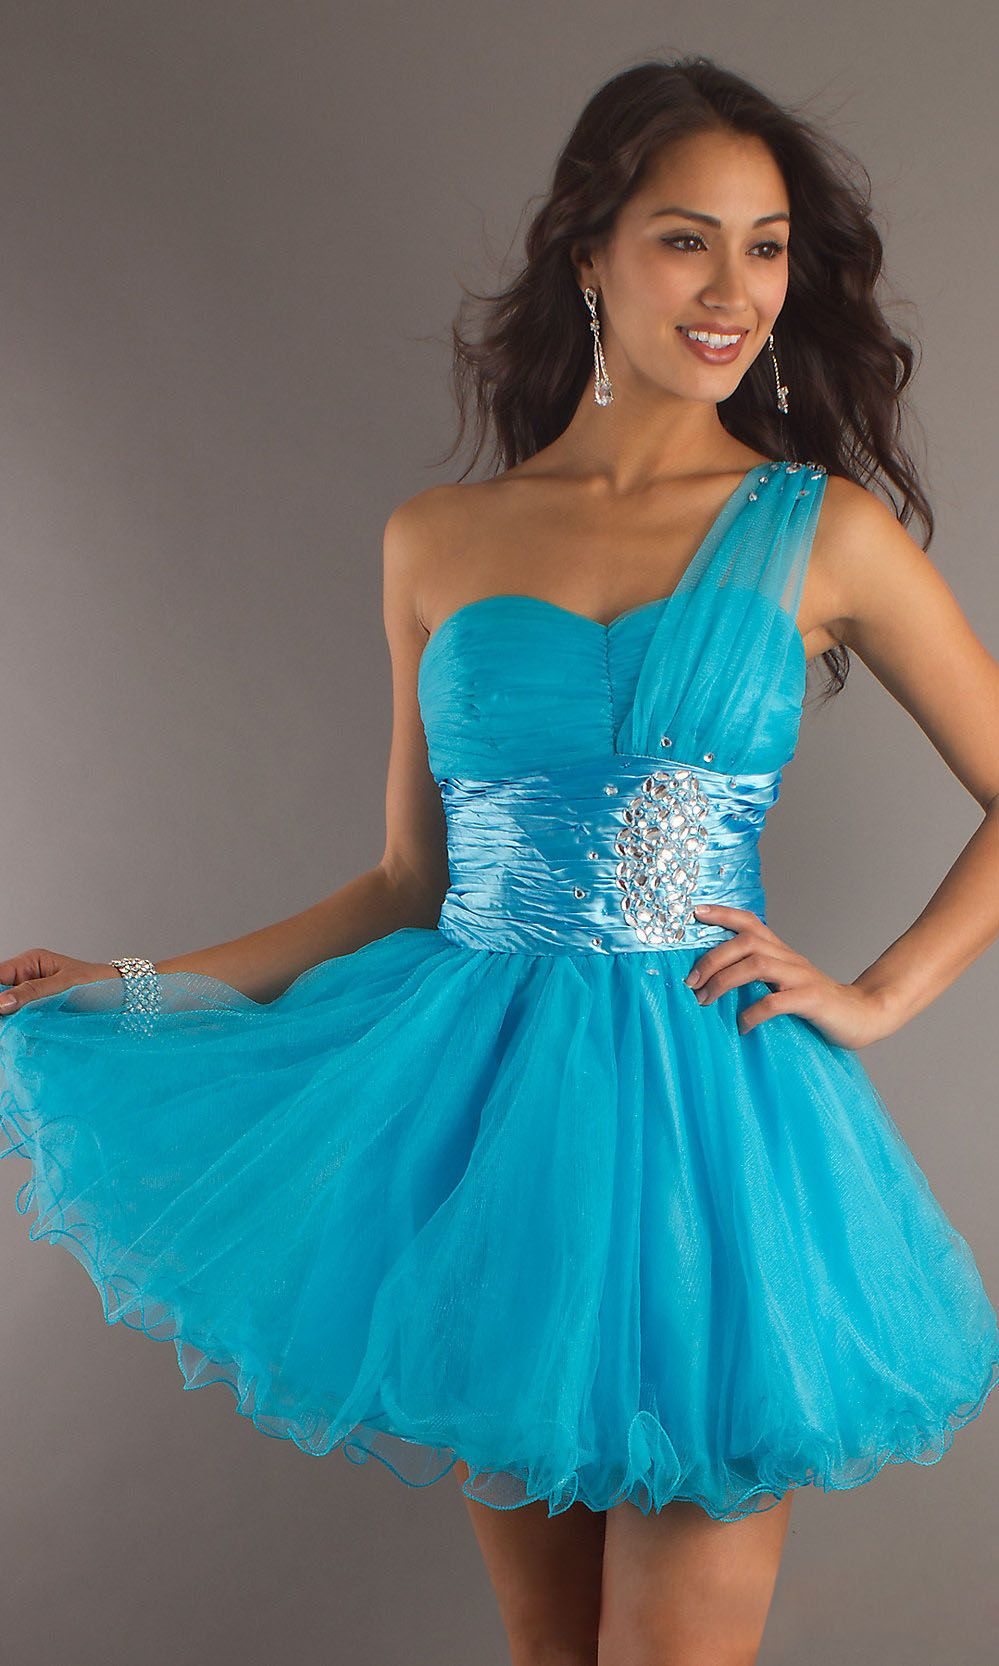 Short One Shoulder Turquoise Homecoming Dress Tulle Skirt Sweetheart ...